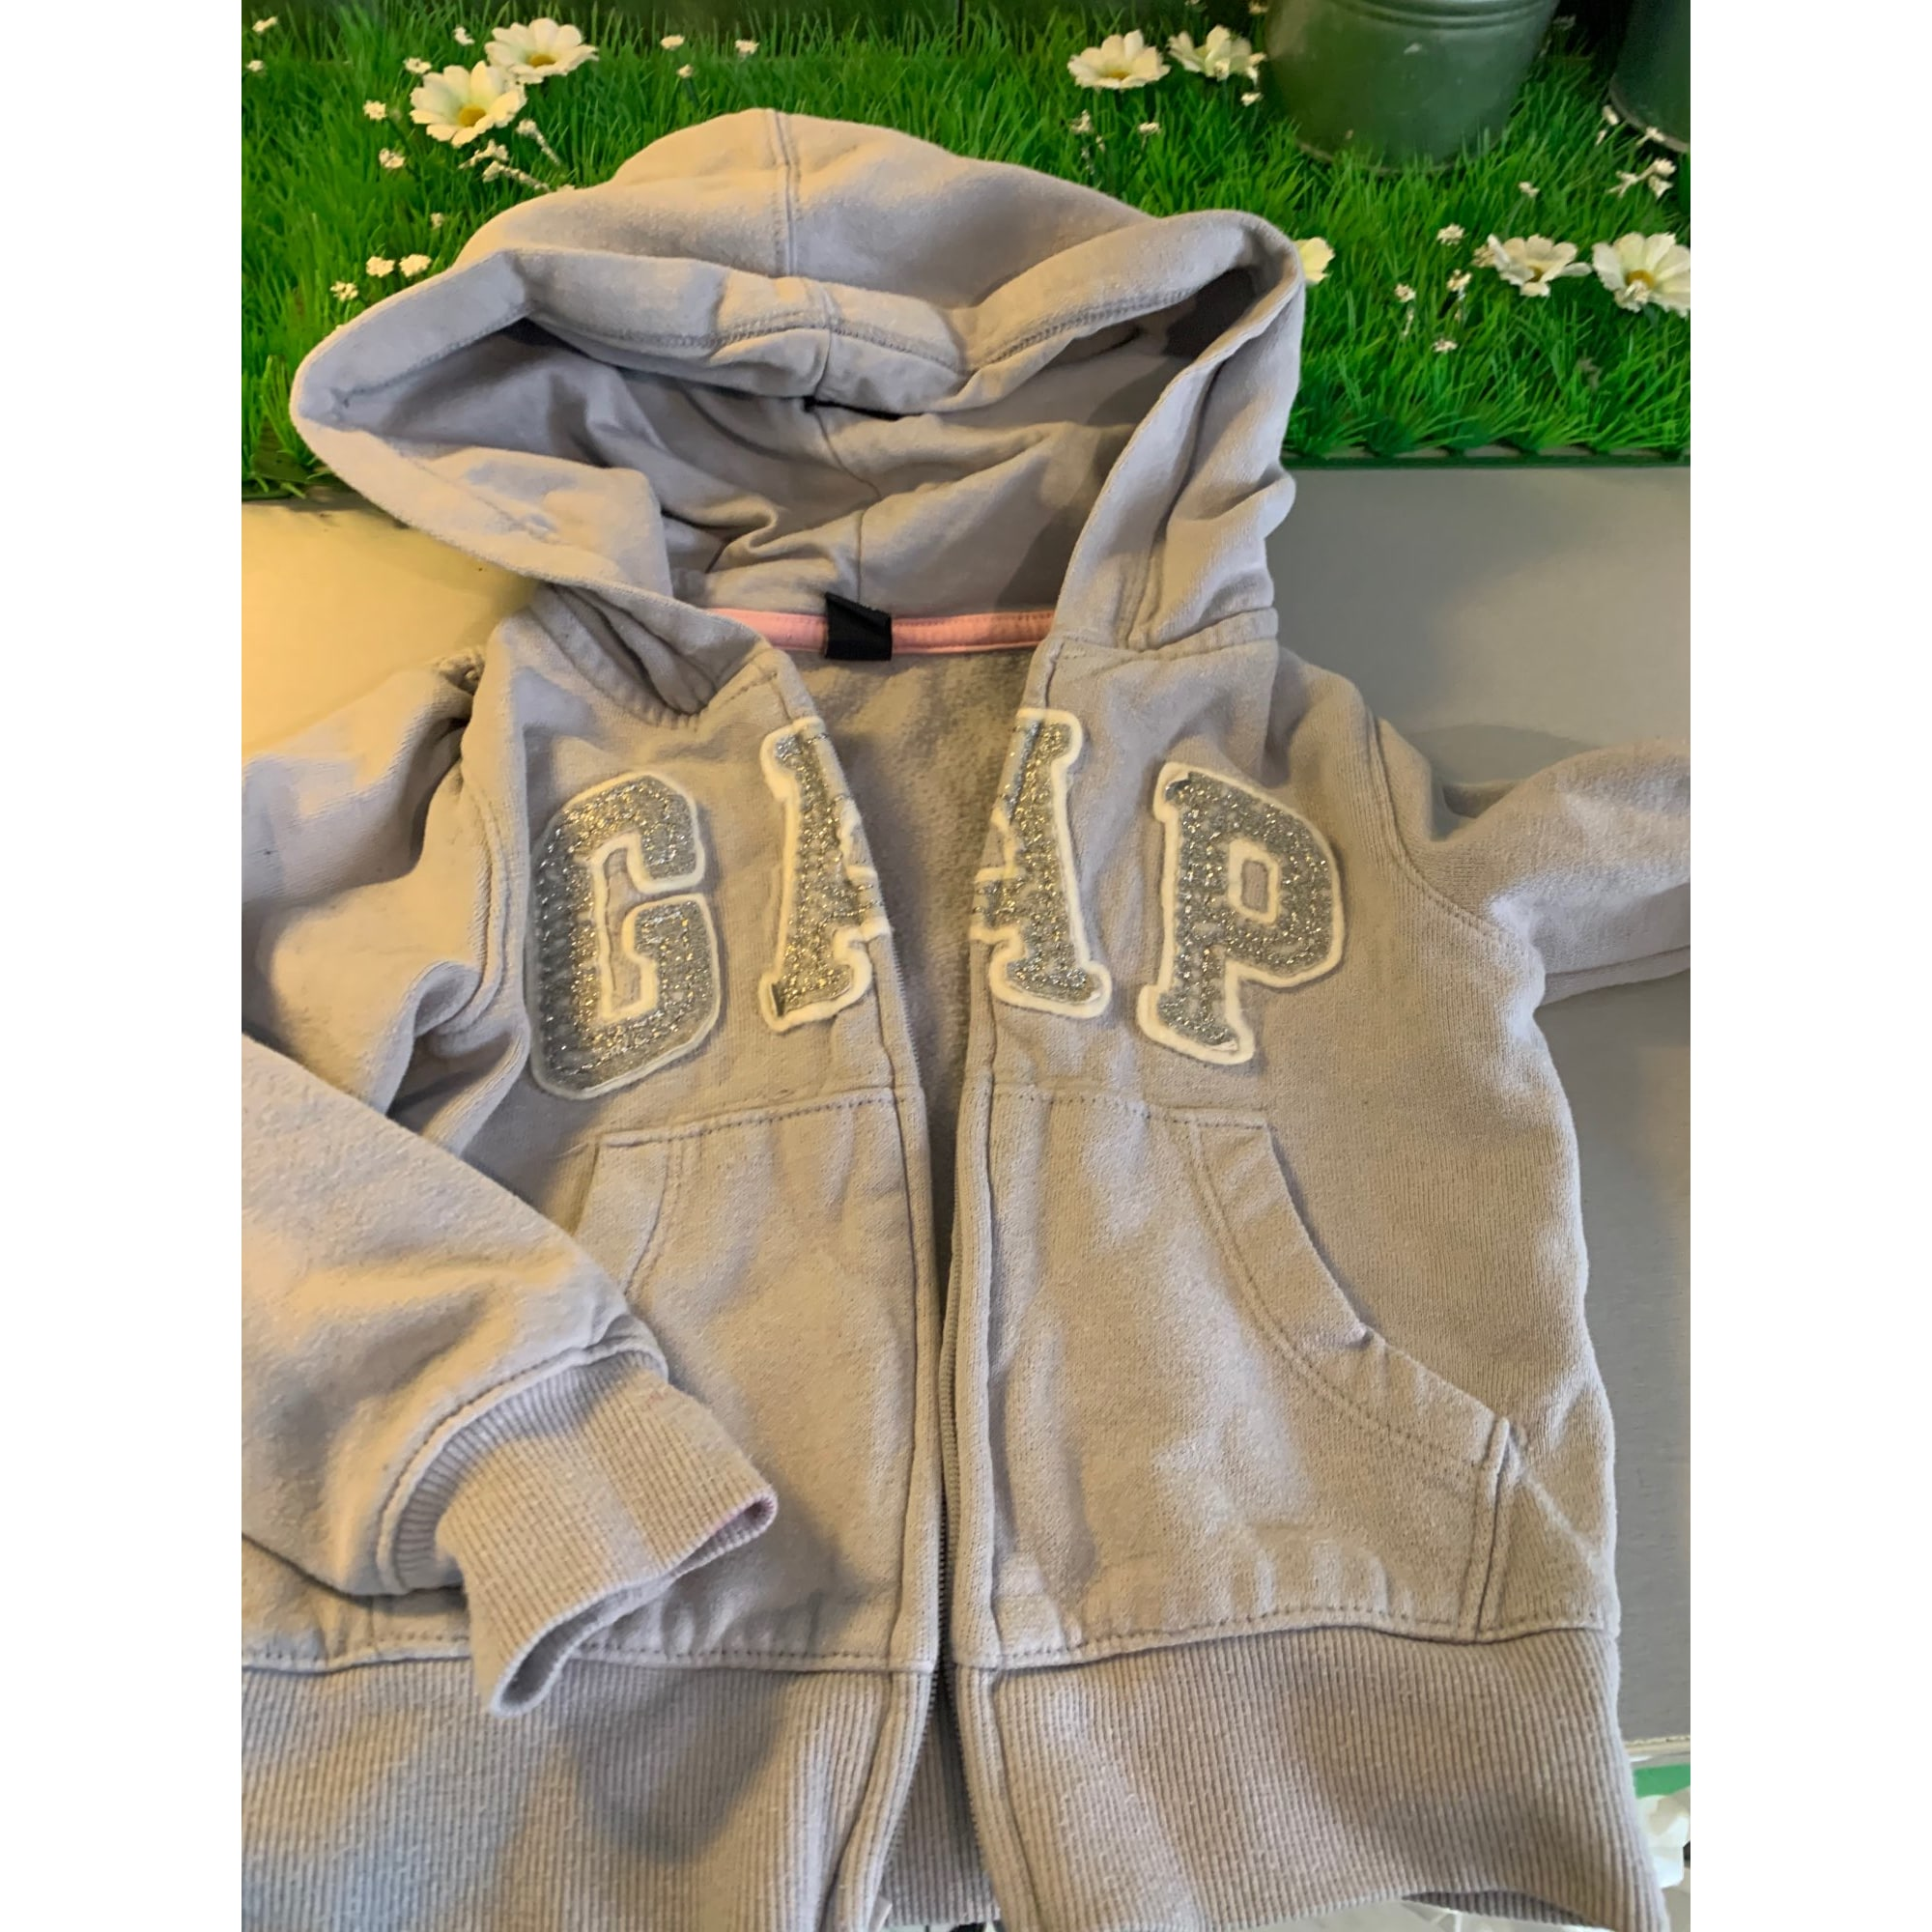 Sweatshirt GAP Gray, charcoal